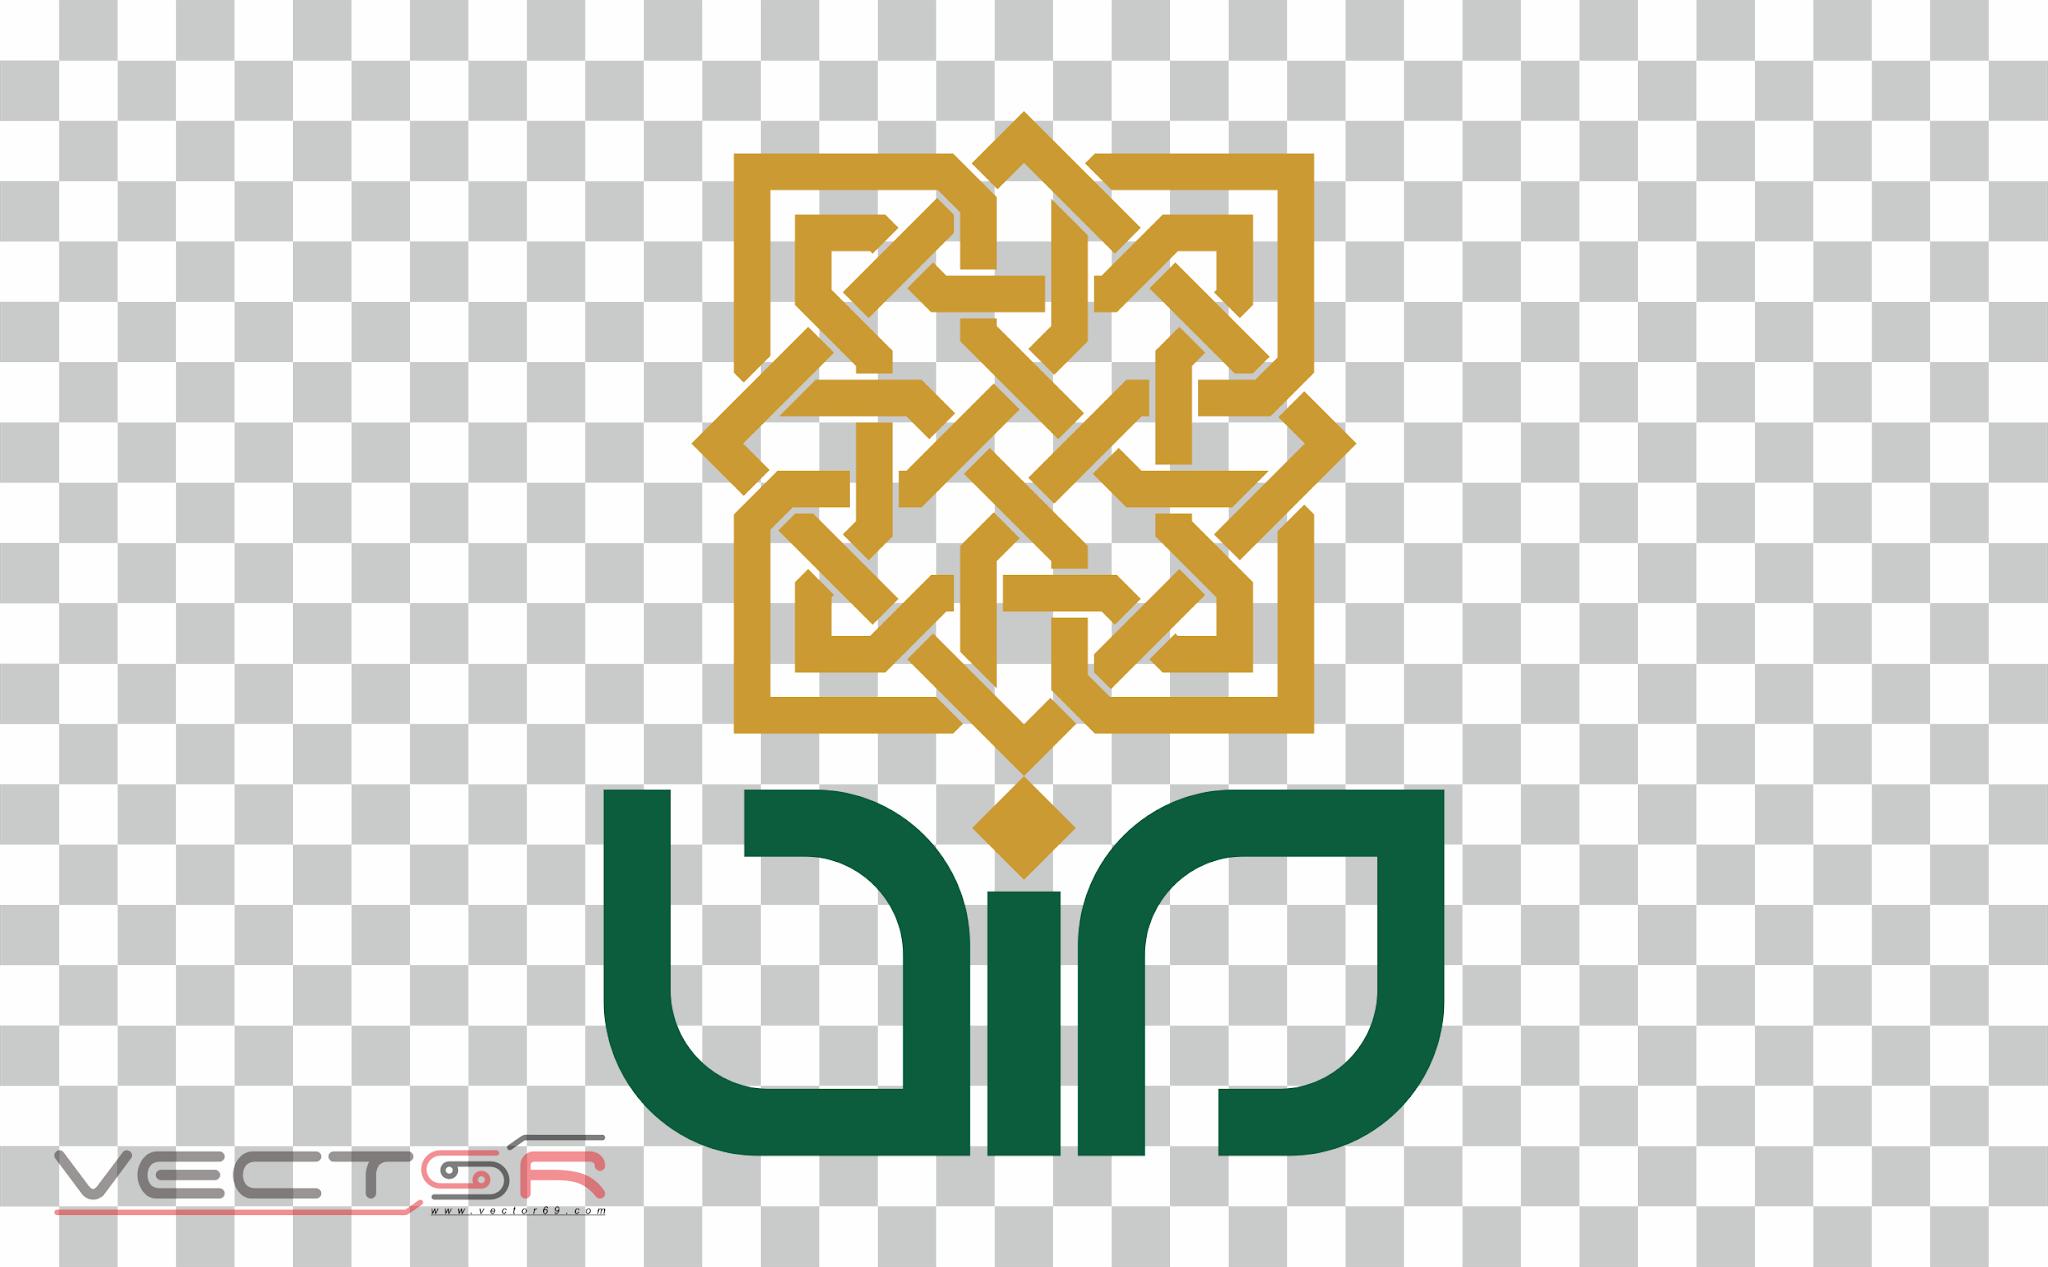 Universitas Islam Negeri Sunan Kalijaga (UINSUKA) Yogyakarta Logo - Download Vector File PNG (Portable Network Graphics)